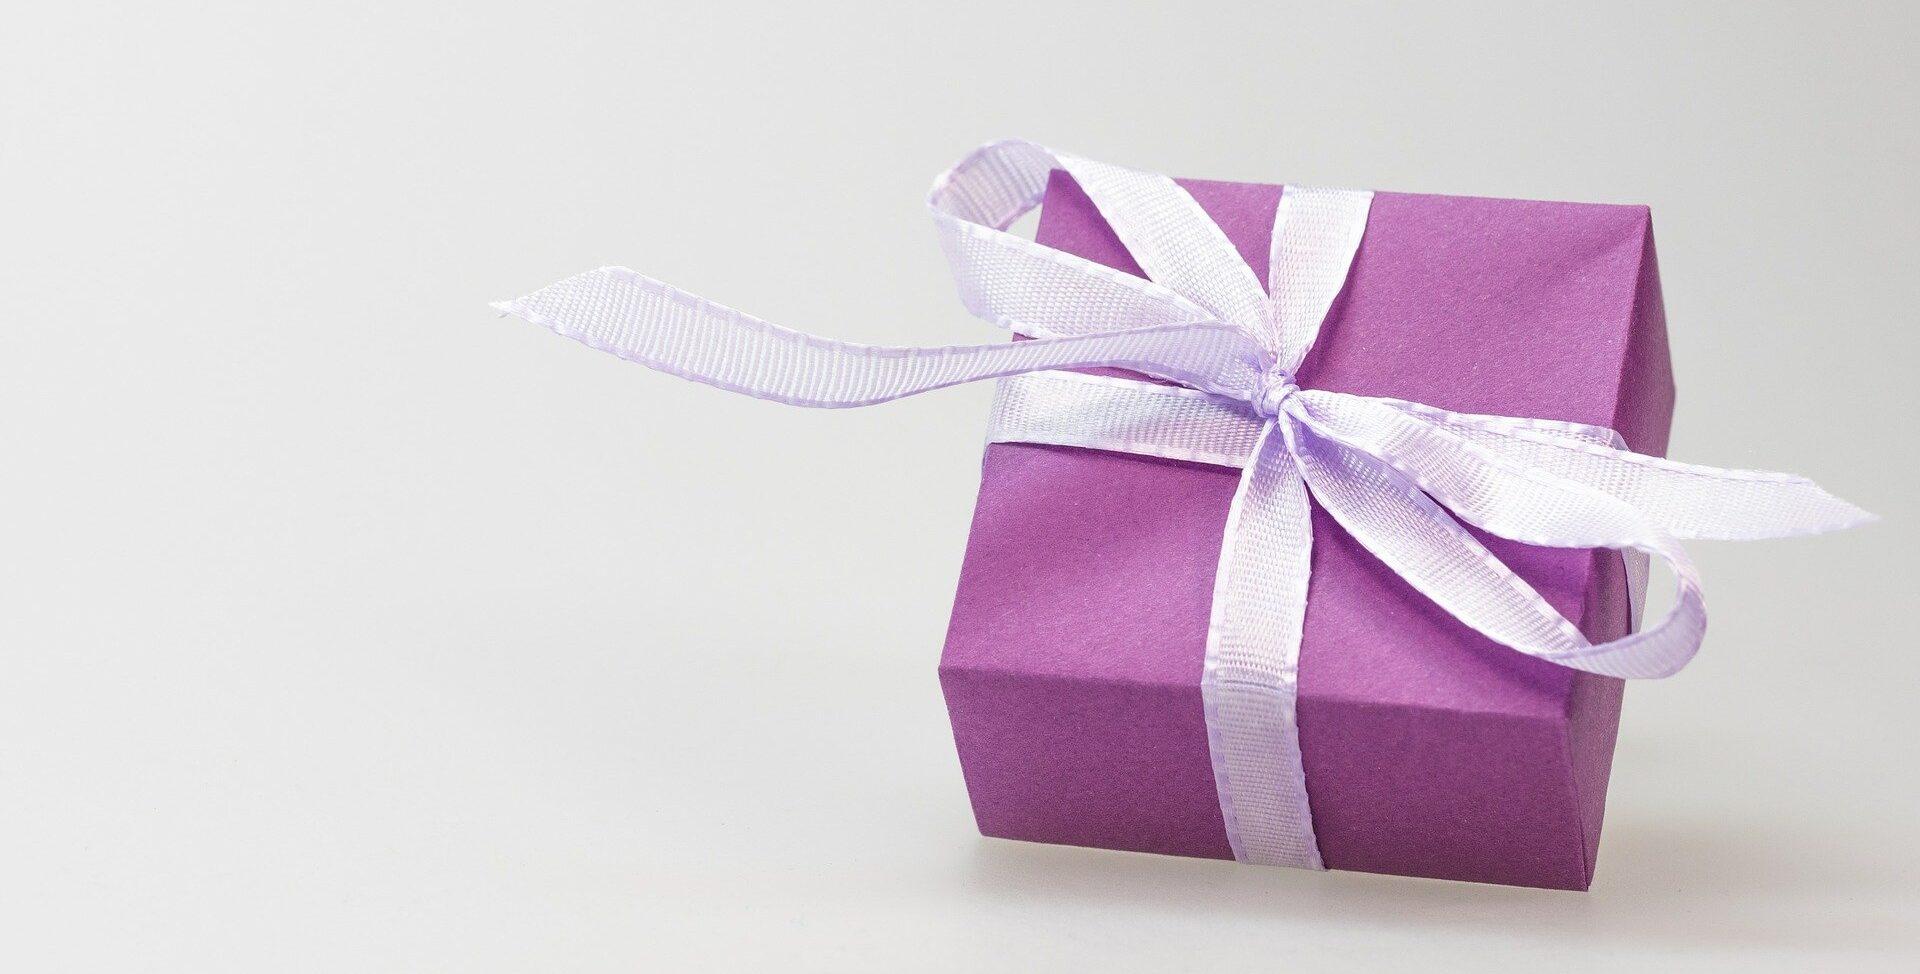 The Gift of Self-Awareness